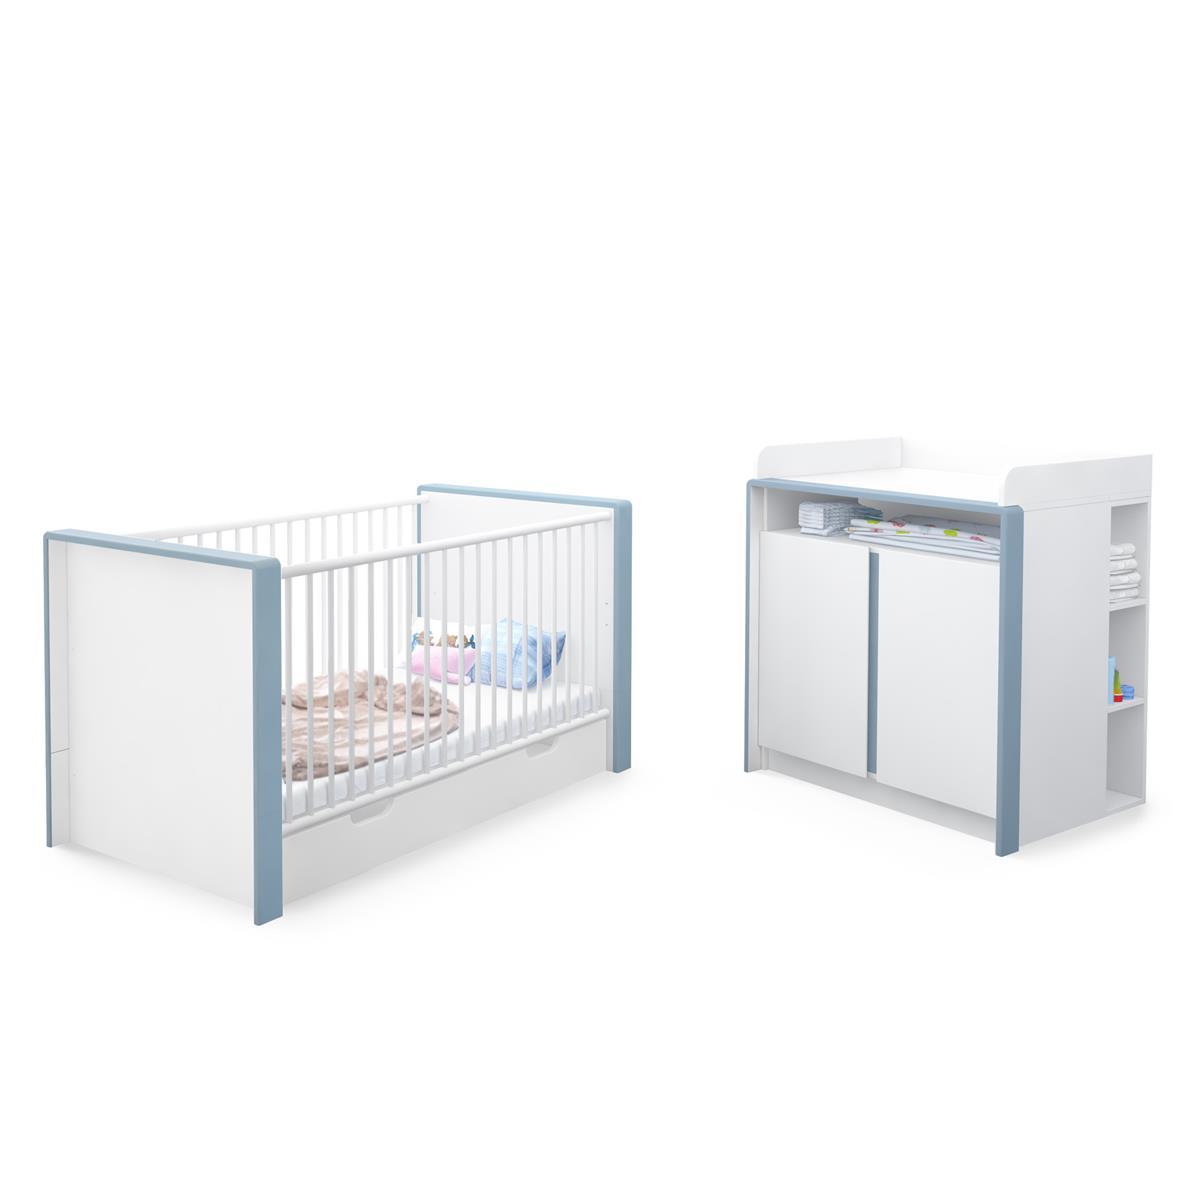 Babyzimmer weiß hochglanz  Babyzimmer Kinderzimmer Babymöbel Komplettset Nandini